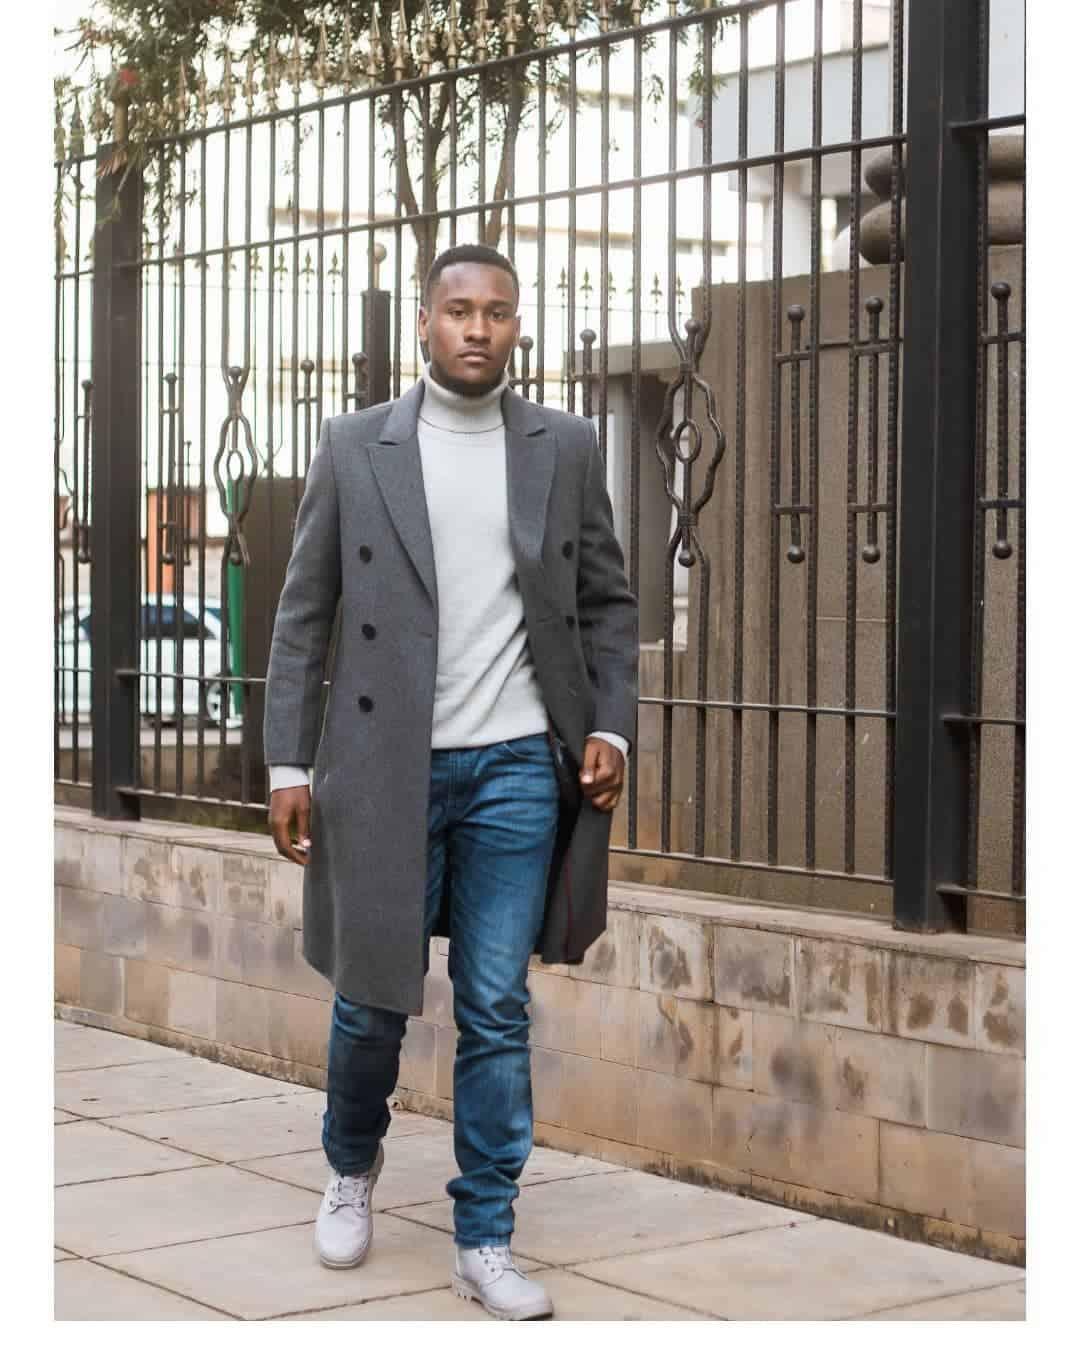 Top 10 mens winter jackets 2020: The Best Winter Jackets ...